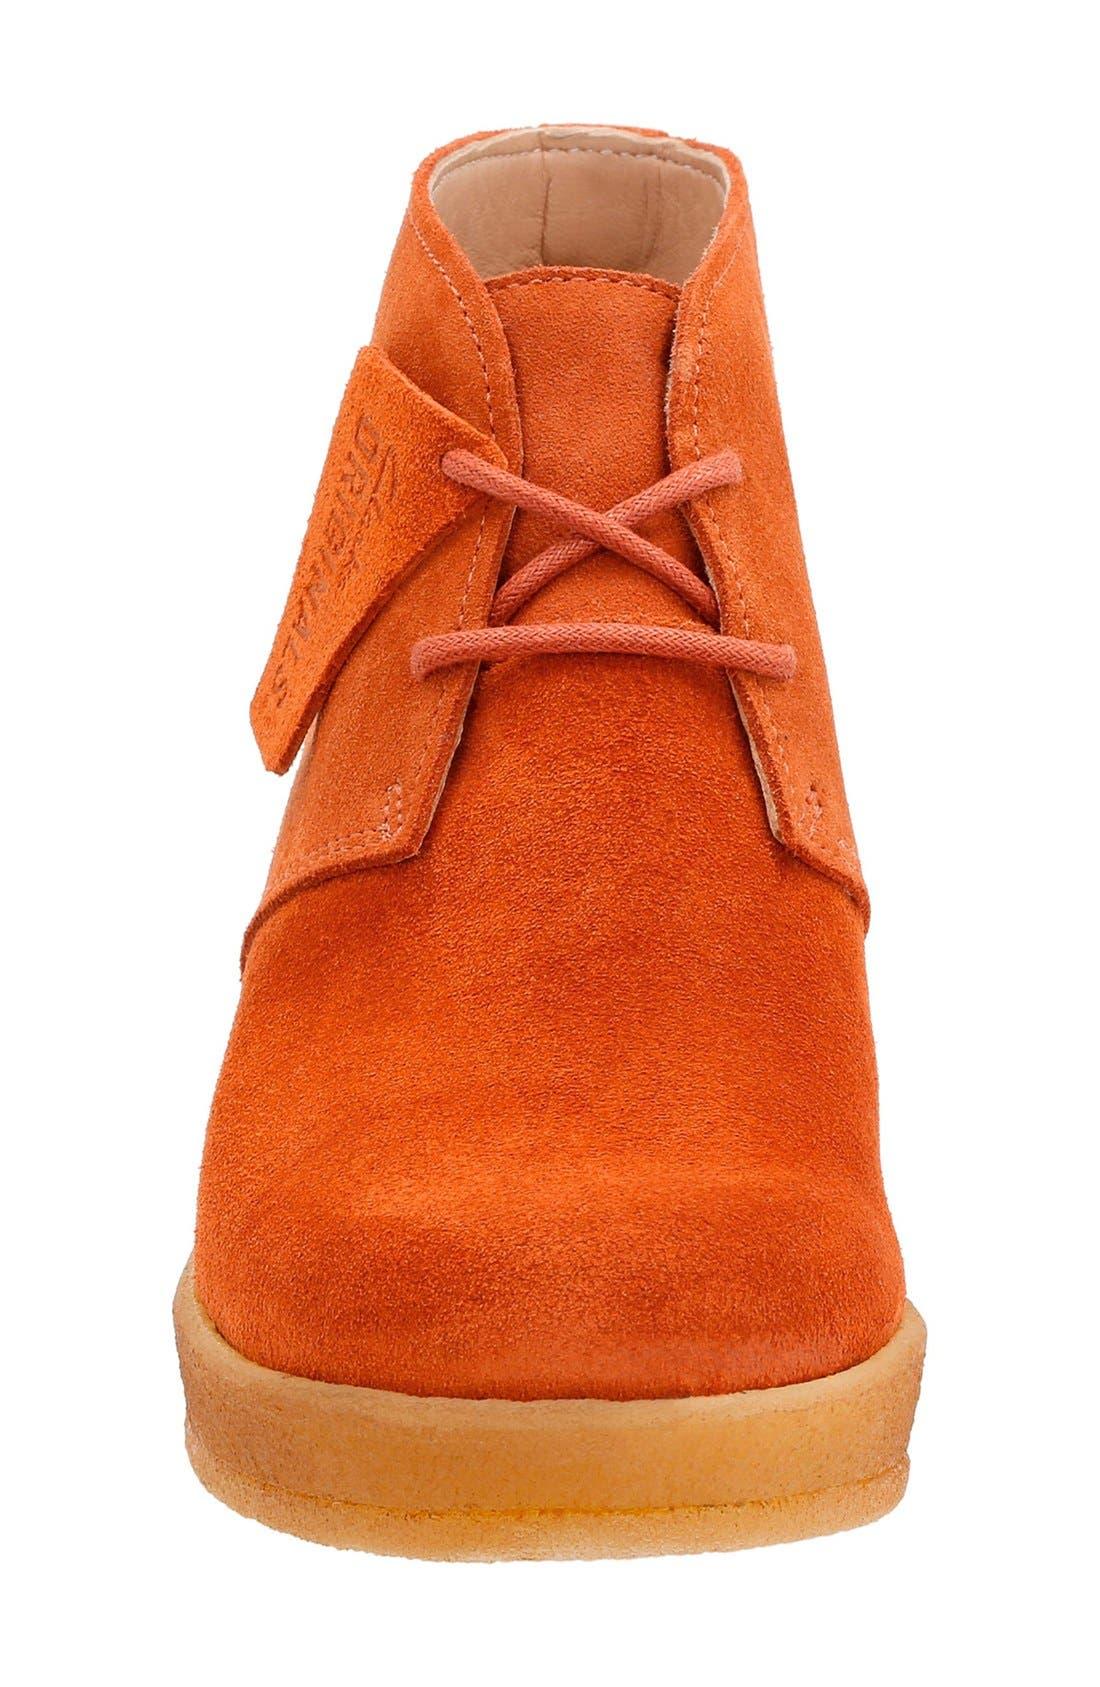 Alternate Image 3  - Clarks® Originals 'Athie Terra' Wedge Boot (Women)